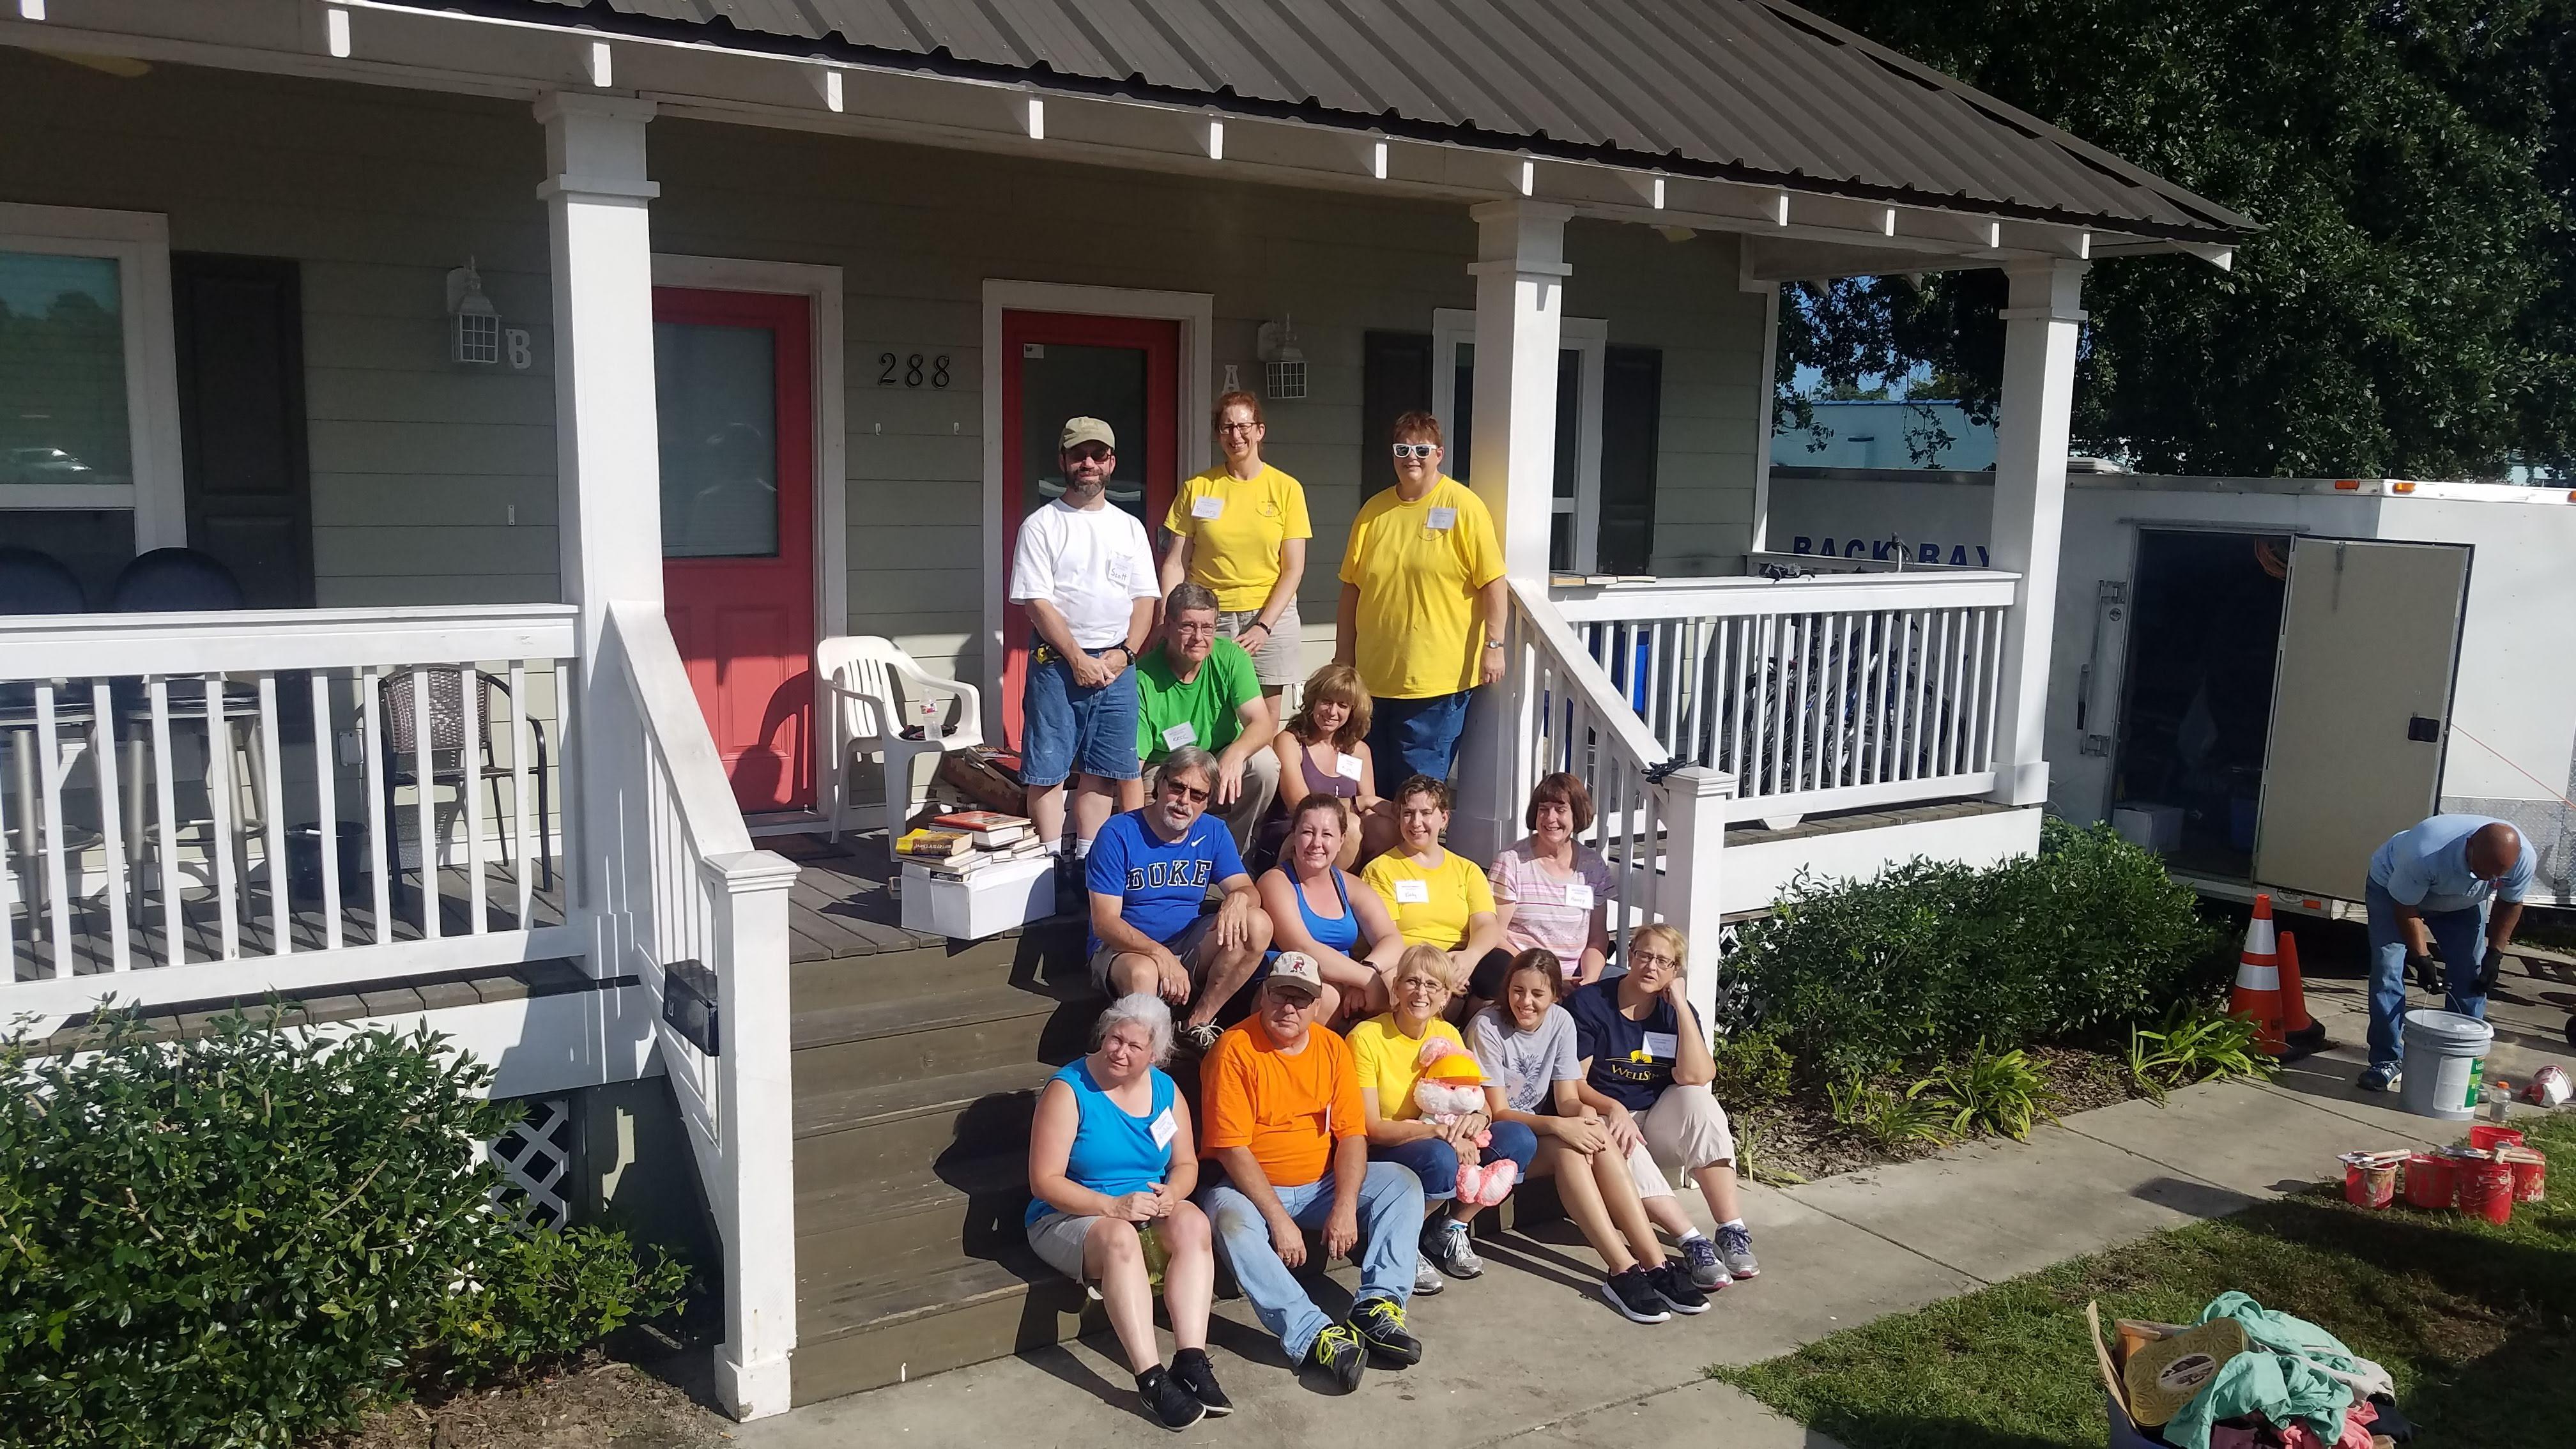 2018 Volunteers: St. Jacob's UCC York New Salem